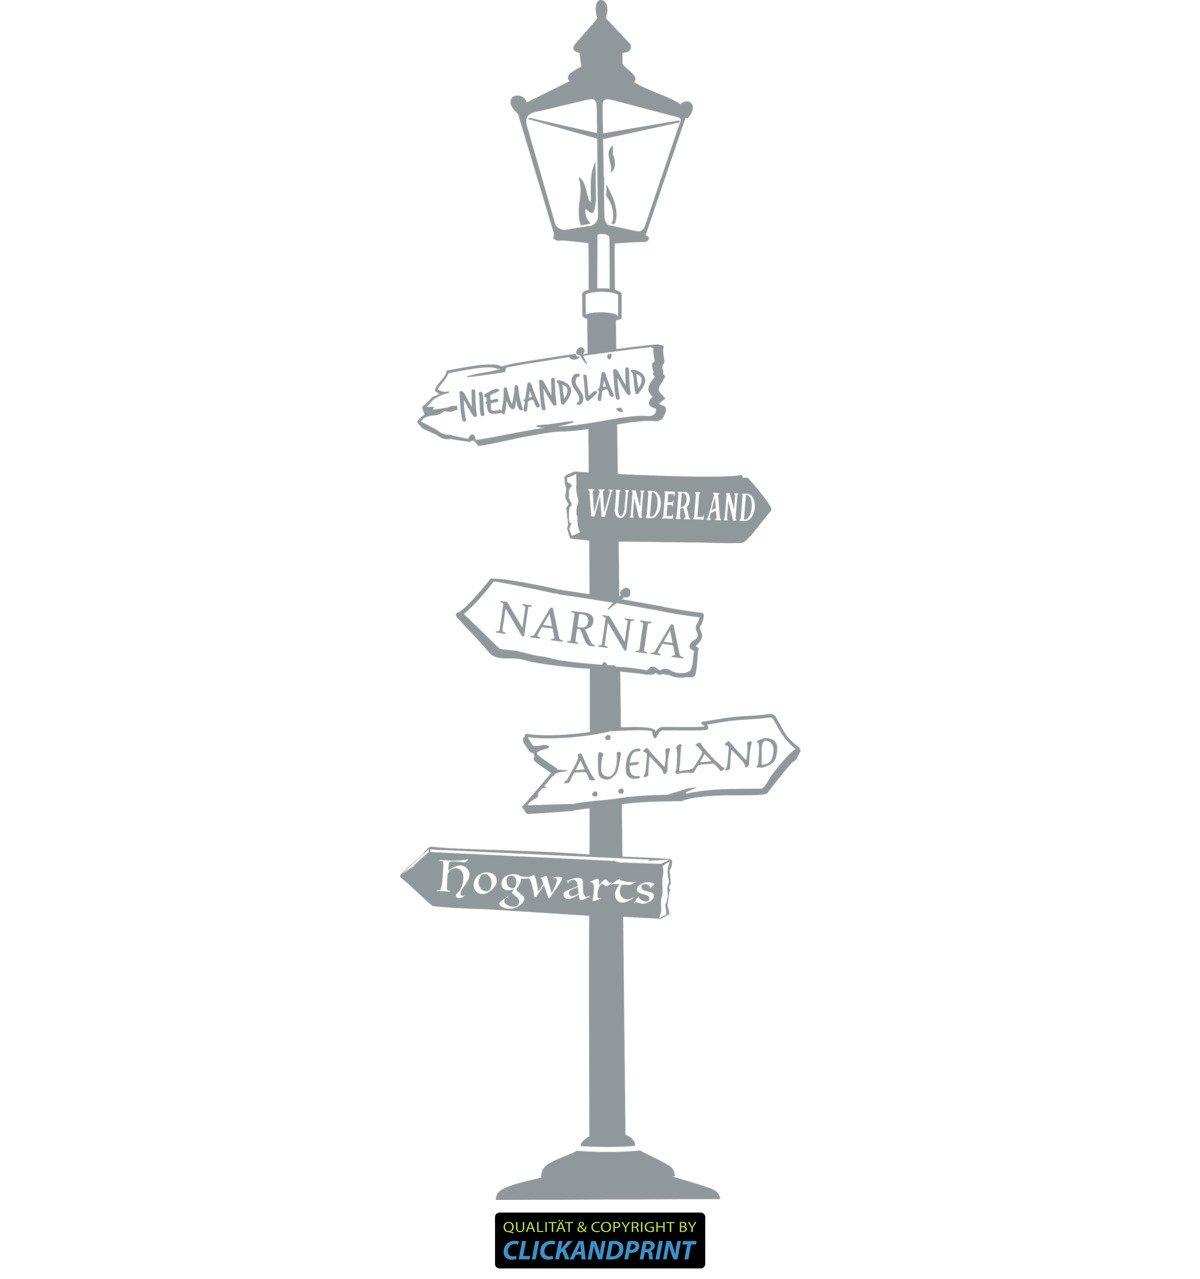 CLICKANDPRINT  Aufkleber » Fantasy Fantasy Fantasy Wegweiser, 180x60,1cm, Silbergrau • Wandtattoo Wandaufkleber Wandsticker Wanddeko Vinyl B075DKXCWP Wandtattoos & Wandbilder 28c714